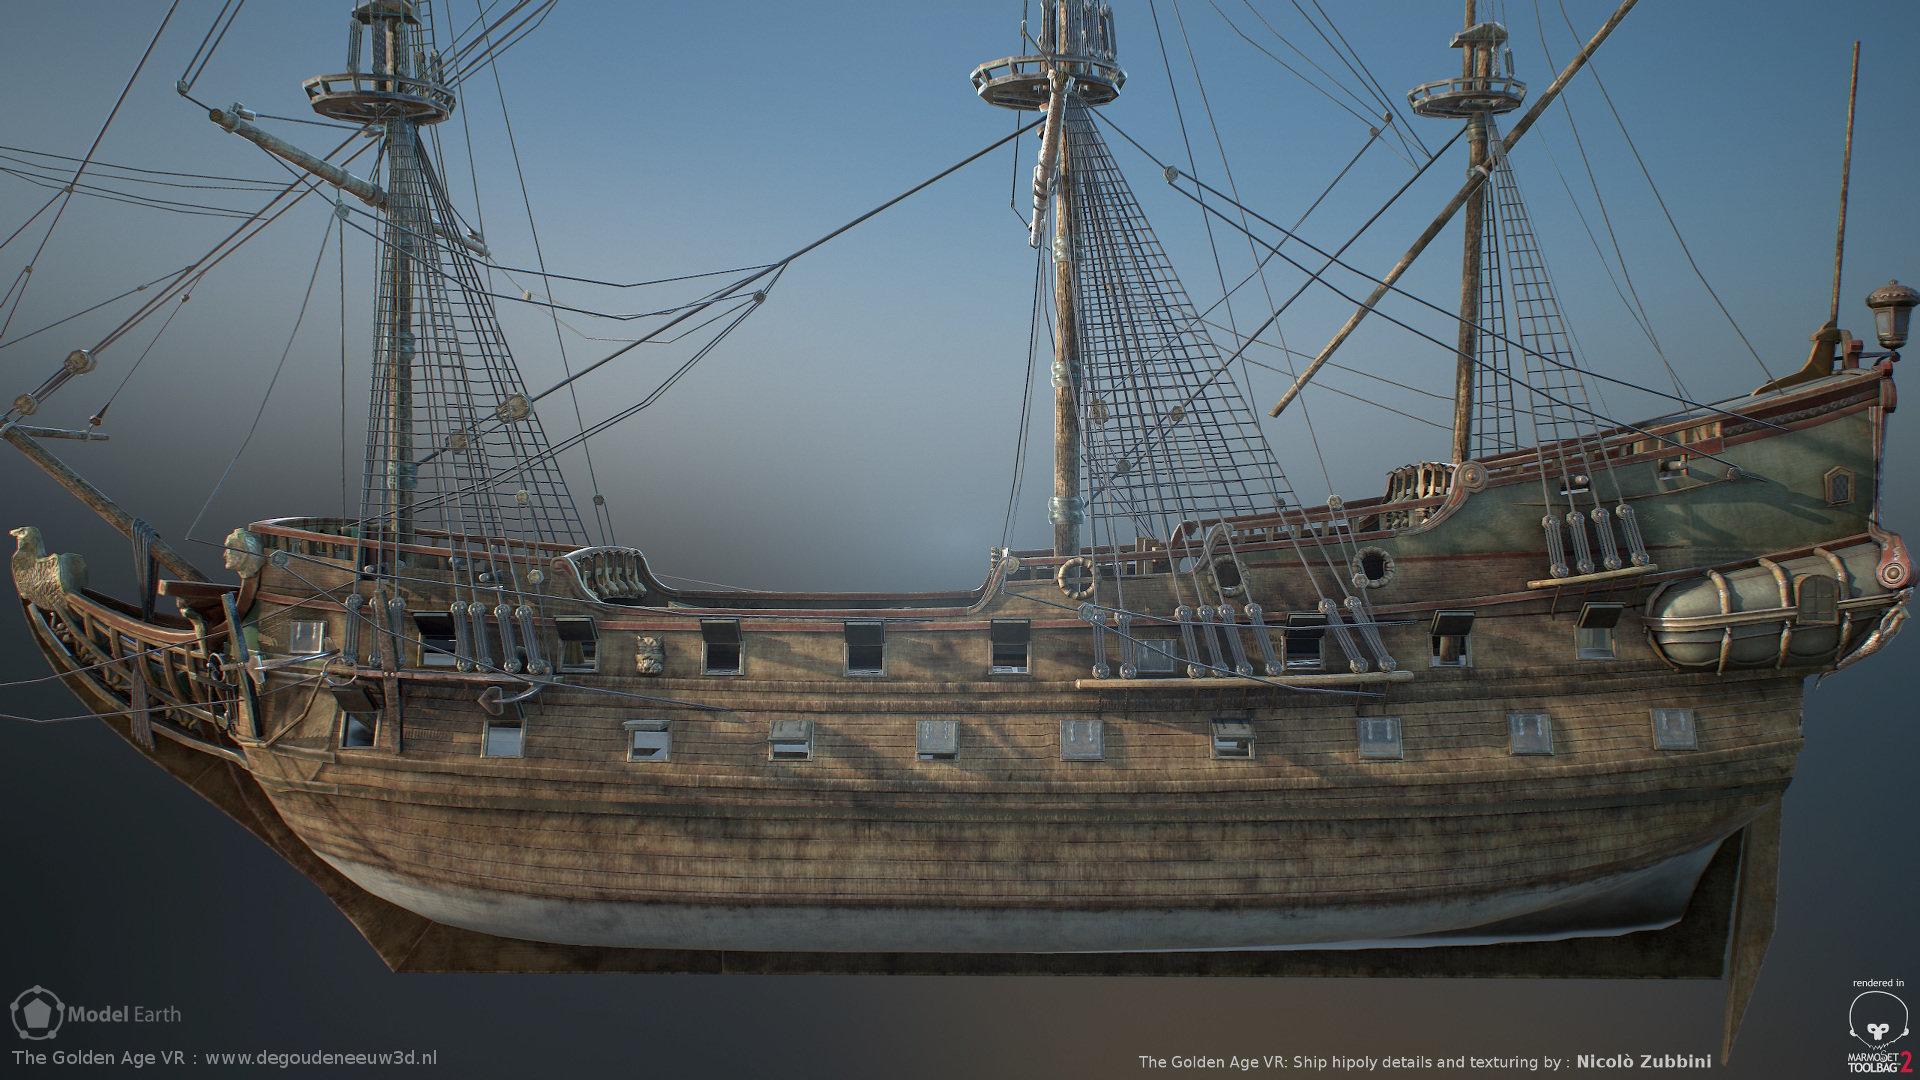 Nicolo zubbini gavr ship render4